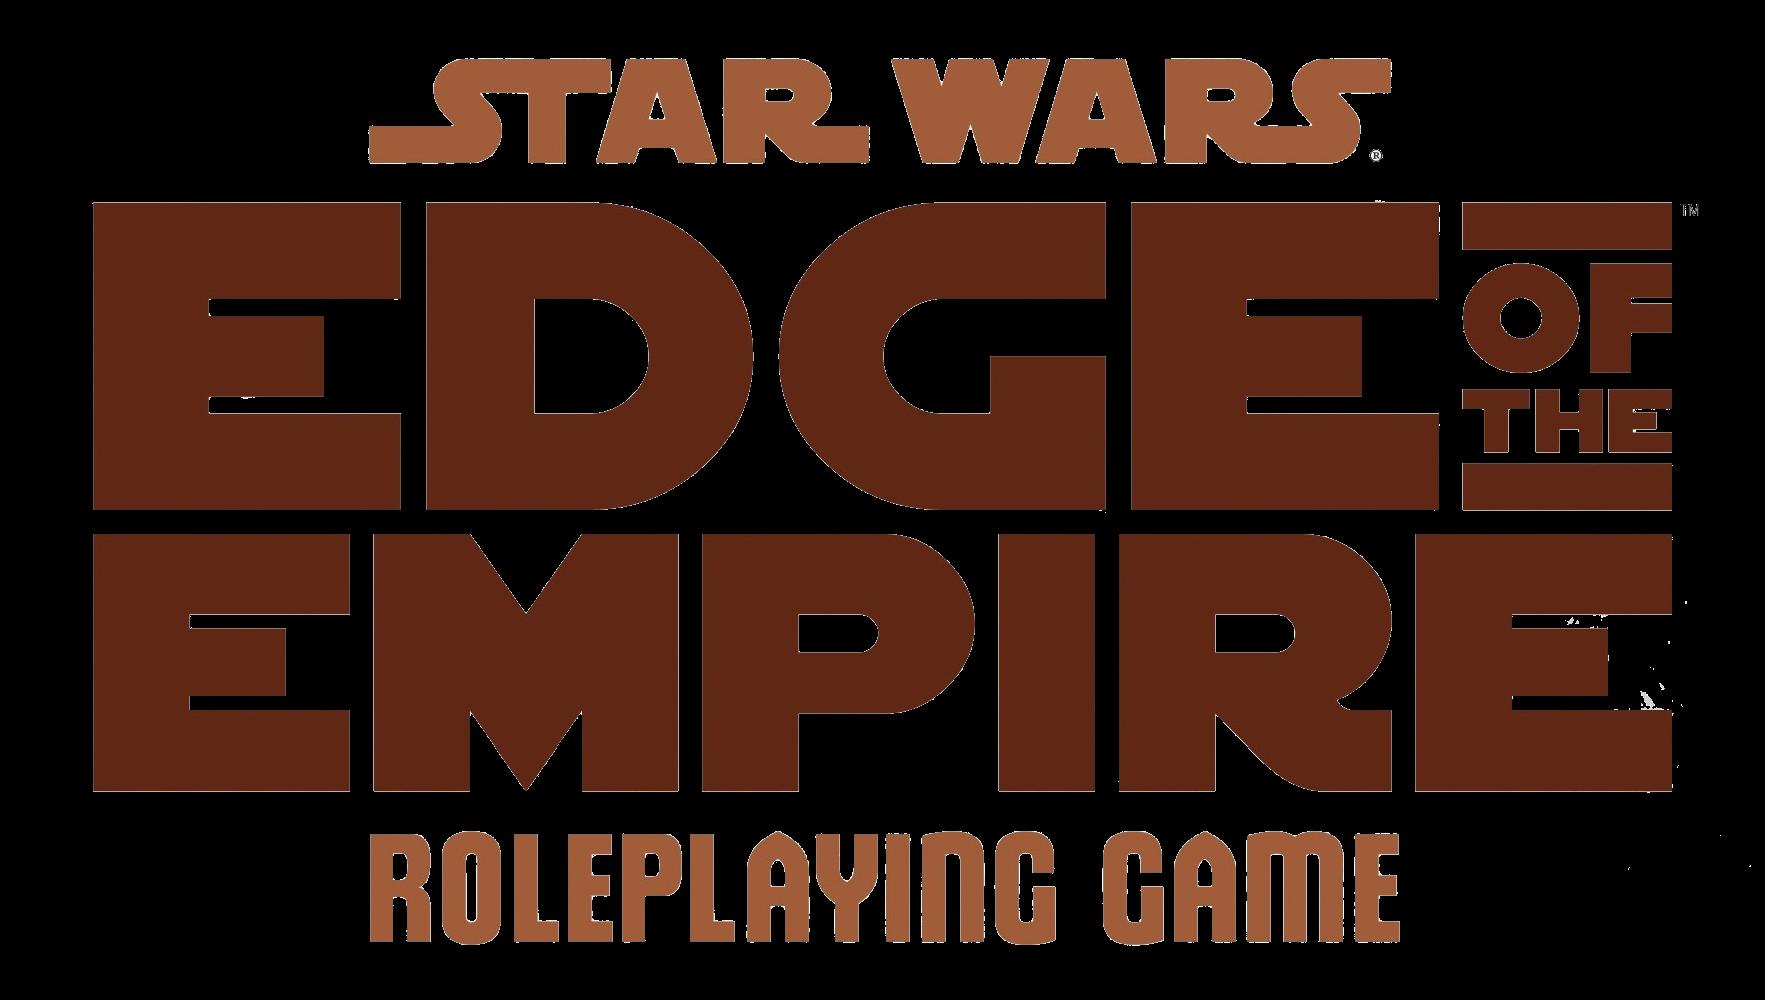 Star Wars Edge Of The Empire Wookieepedia Fandom Powered By Wikia